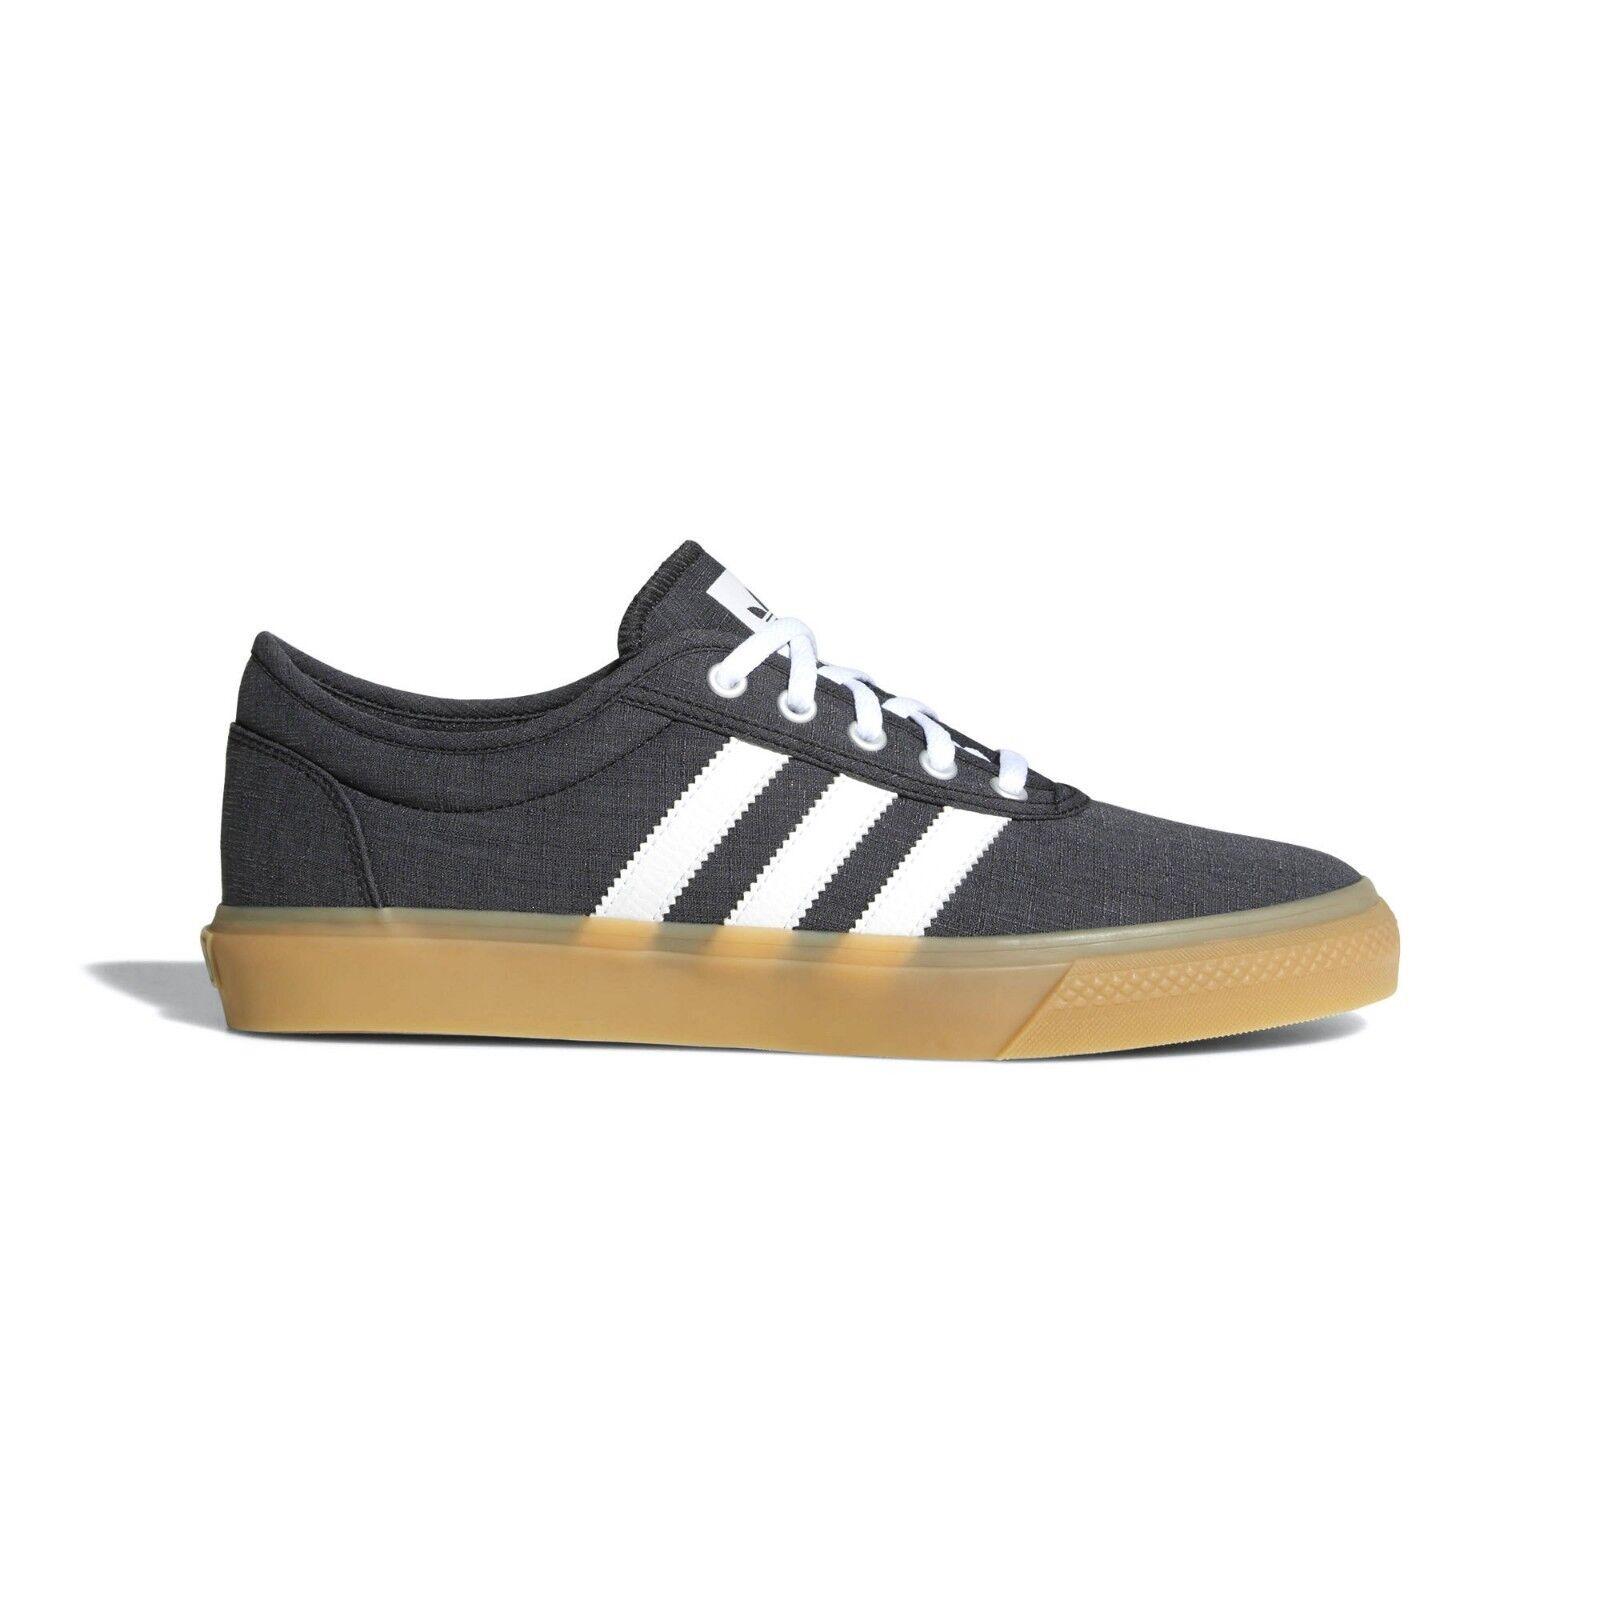 Adidas - skate dga -cq1067 - Uomo skate - shoeschambray - nero / bianco / gomma 4d1500